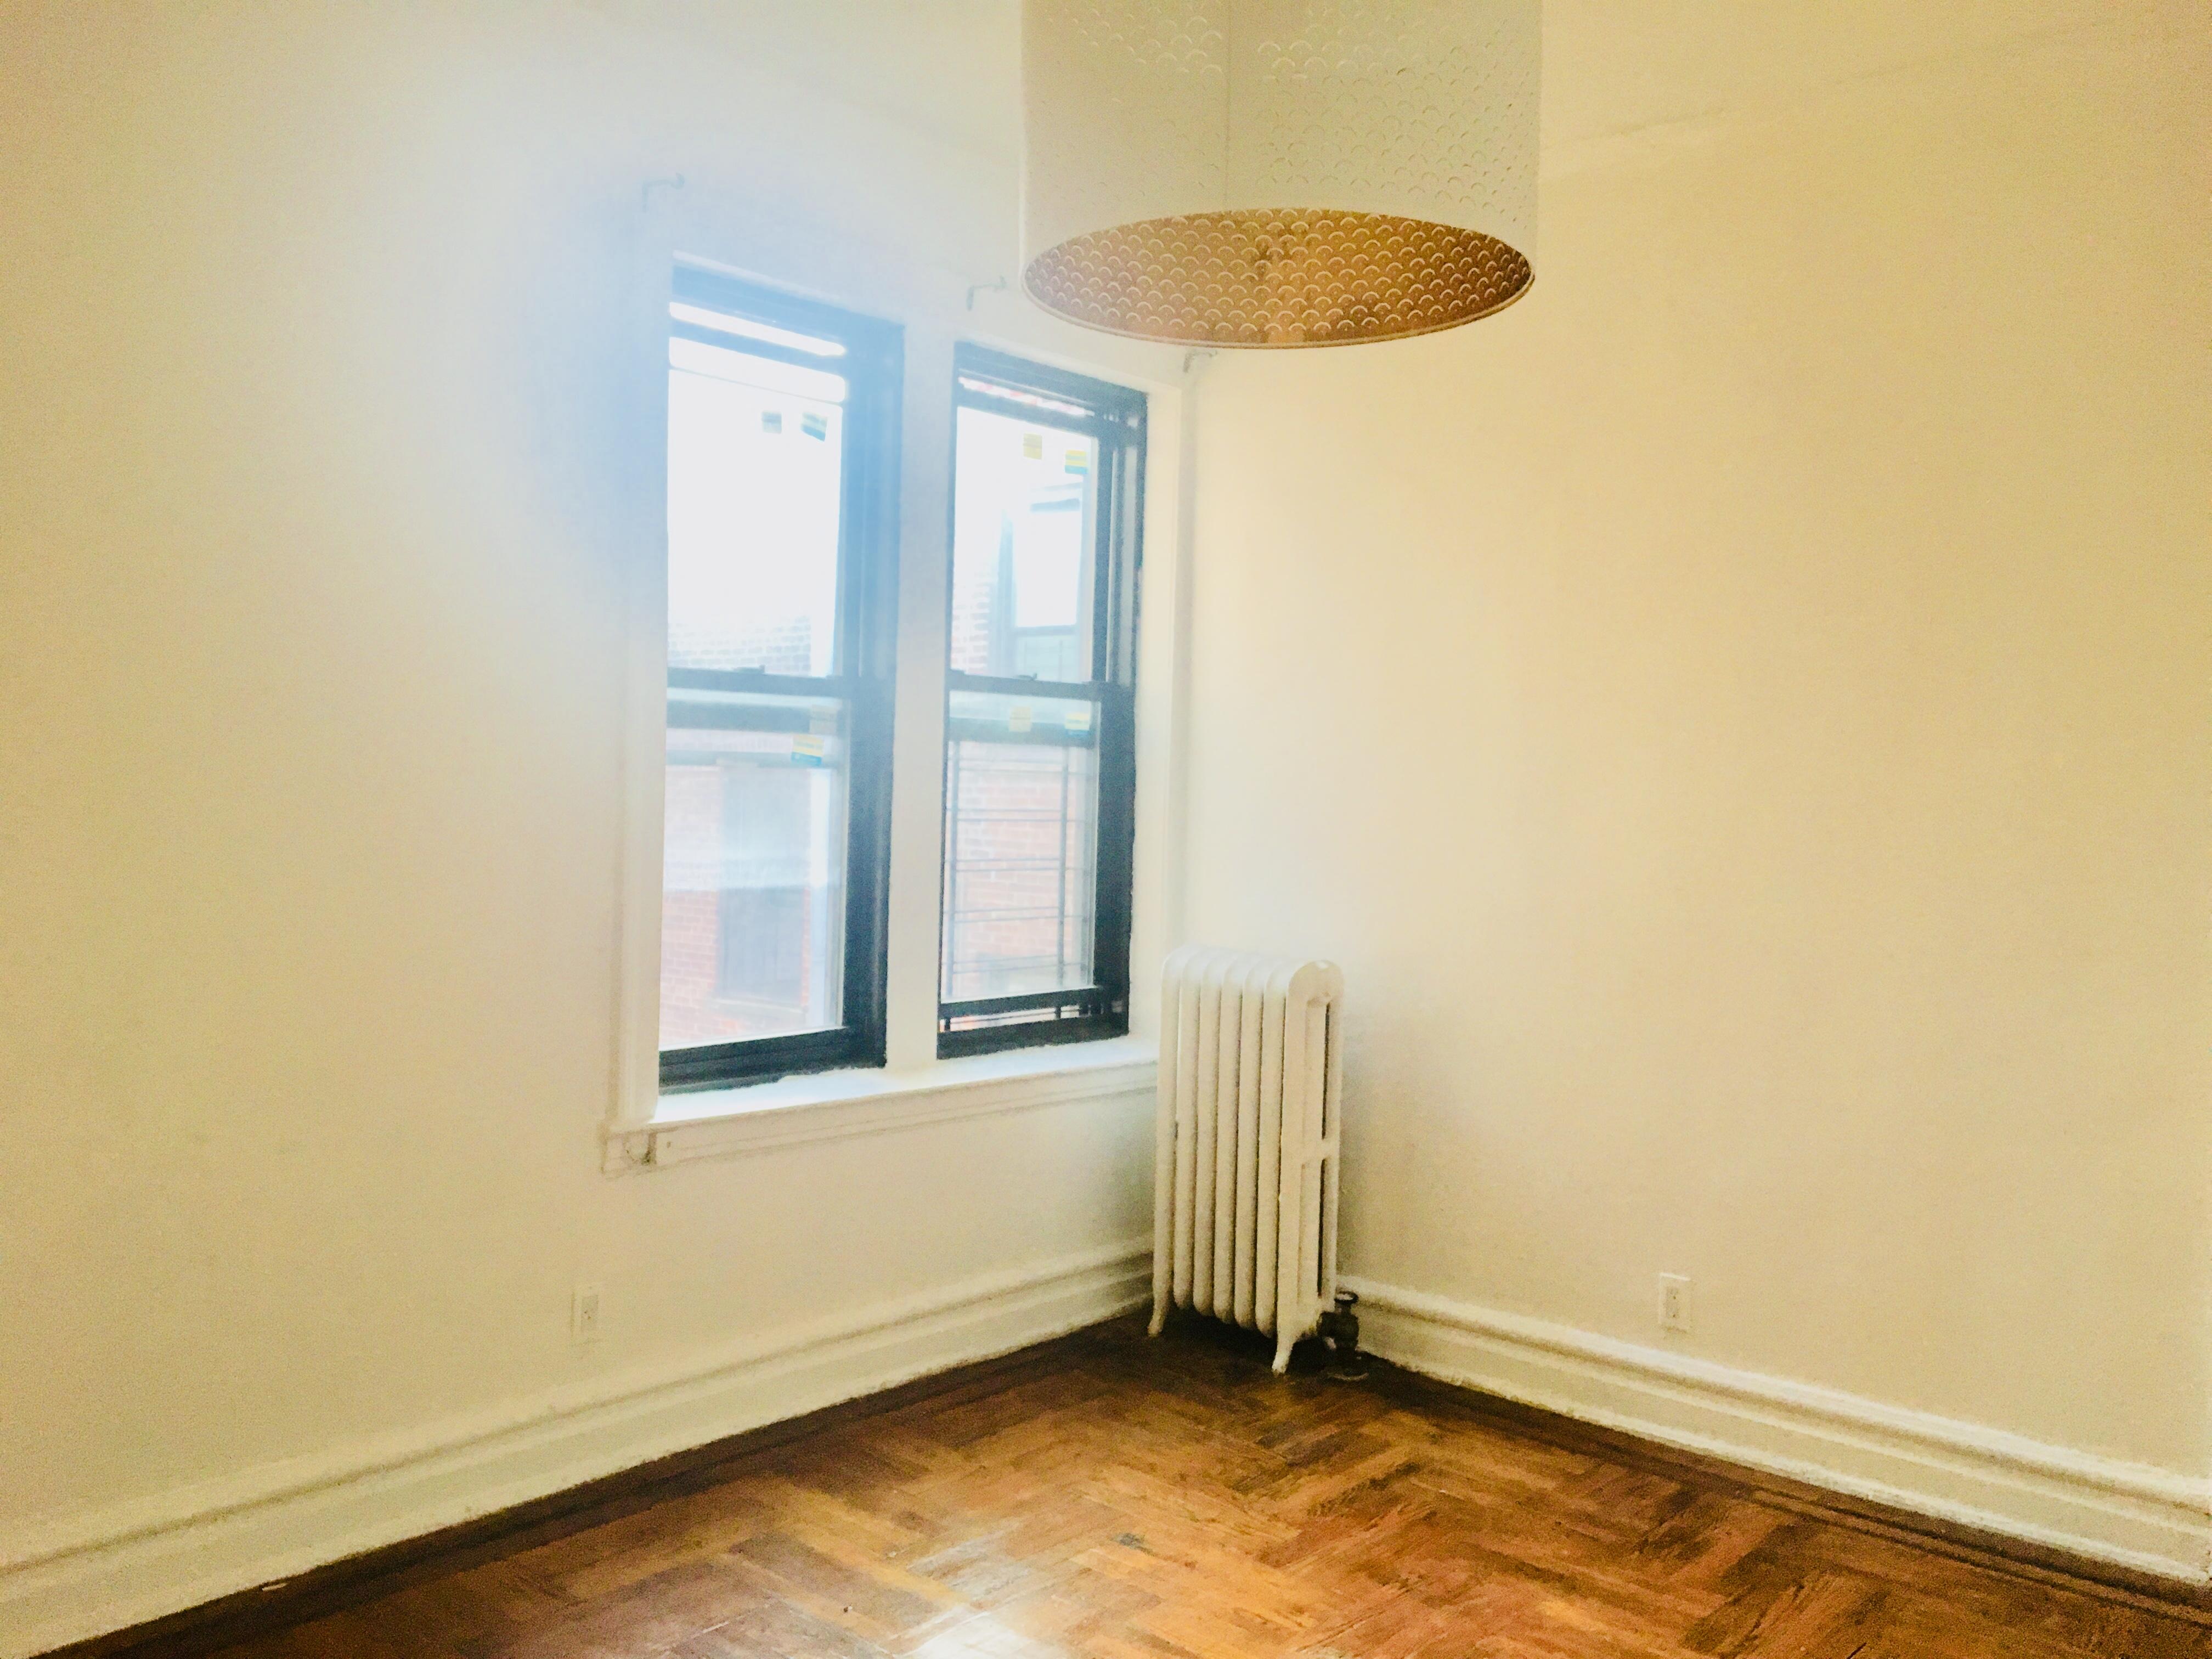 674 47th Street, Apt #3C, Brooklyn, New York 11220